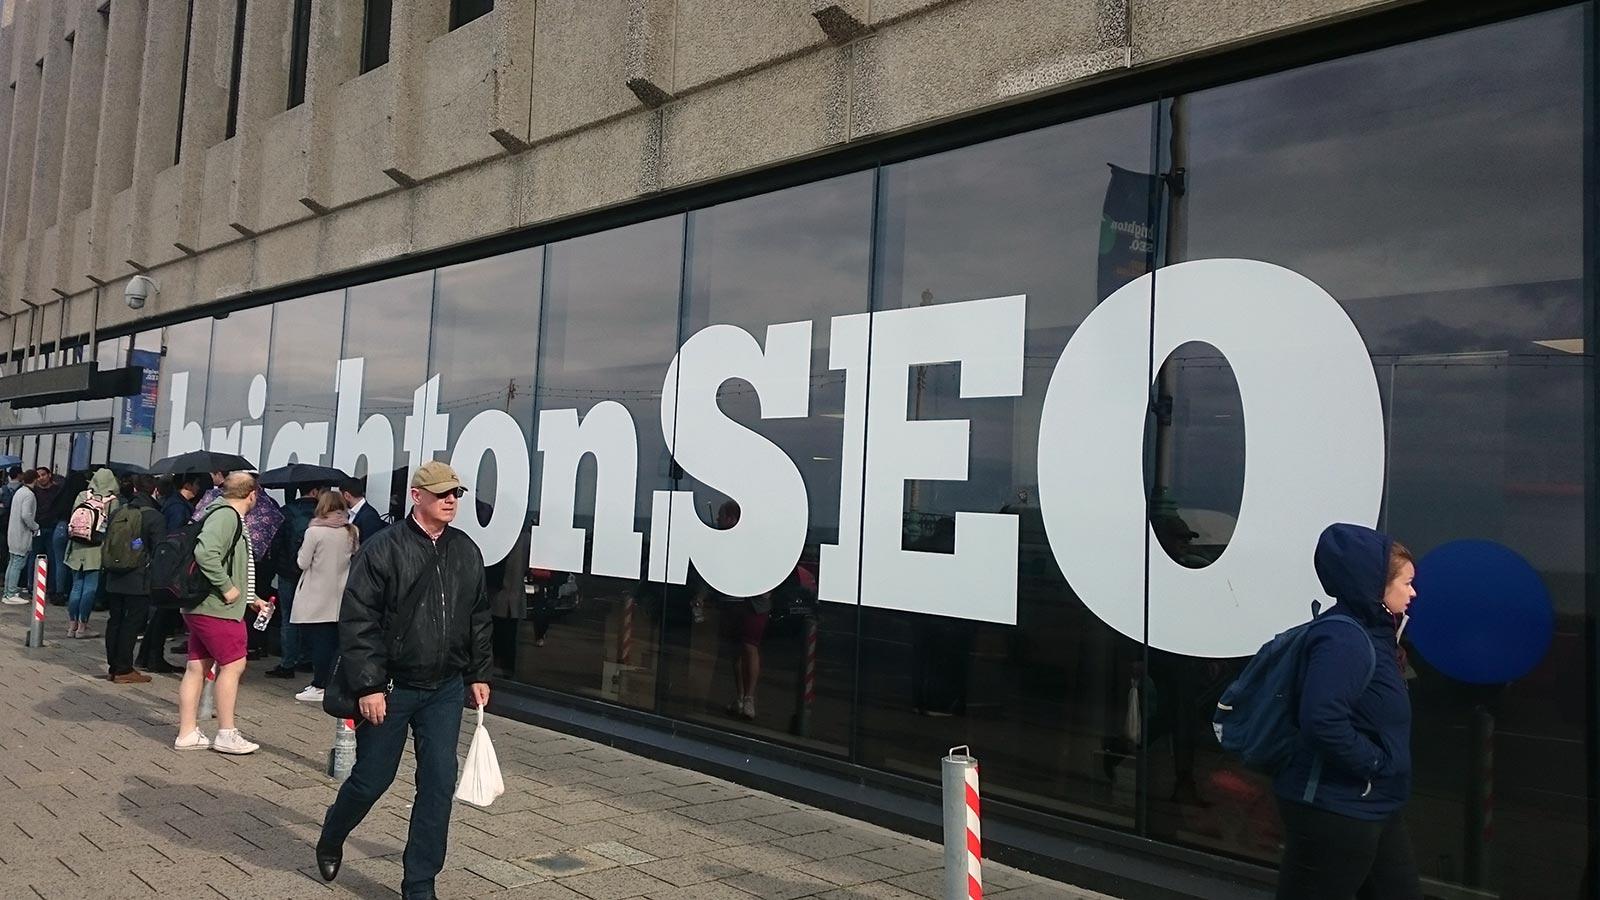 #brightonSEO conference branding